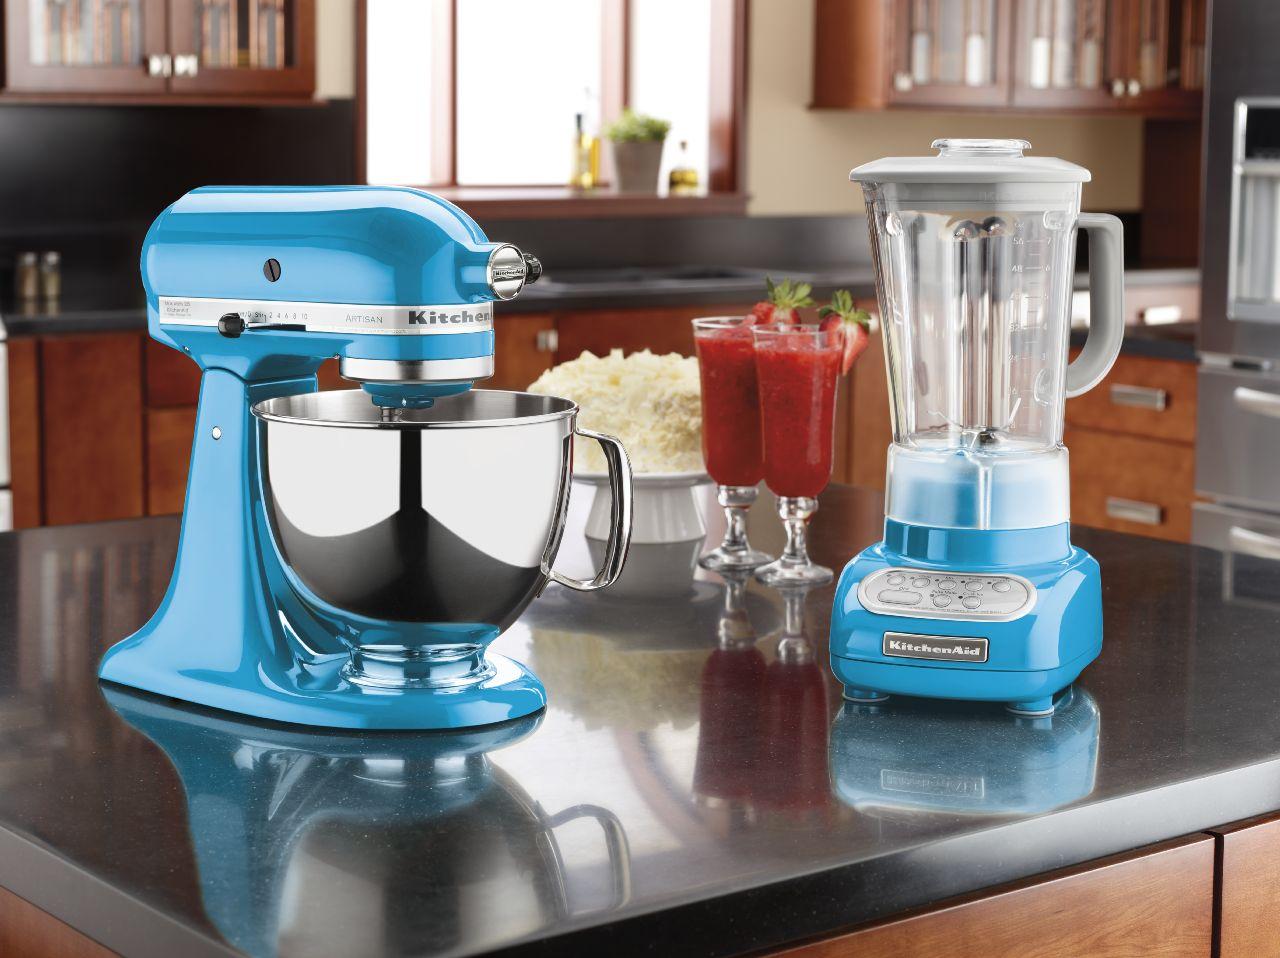 KitchenAid-Artisan-Series-5-Quart-Tilt-Head-Stand-Mixer-10-Speeds-KSM150PS thumbnail 48